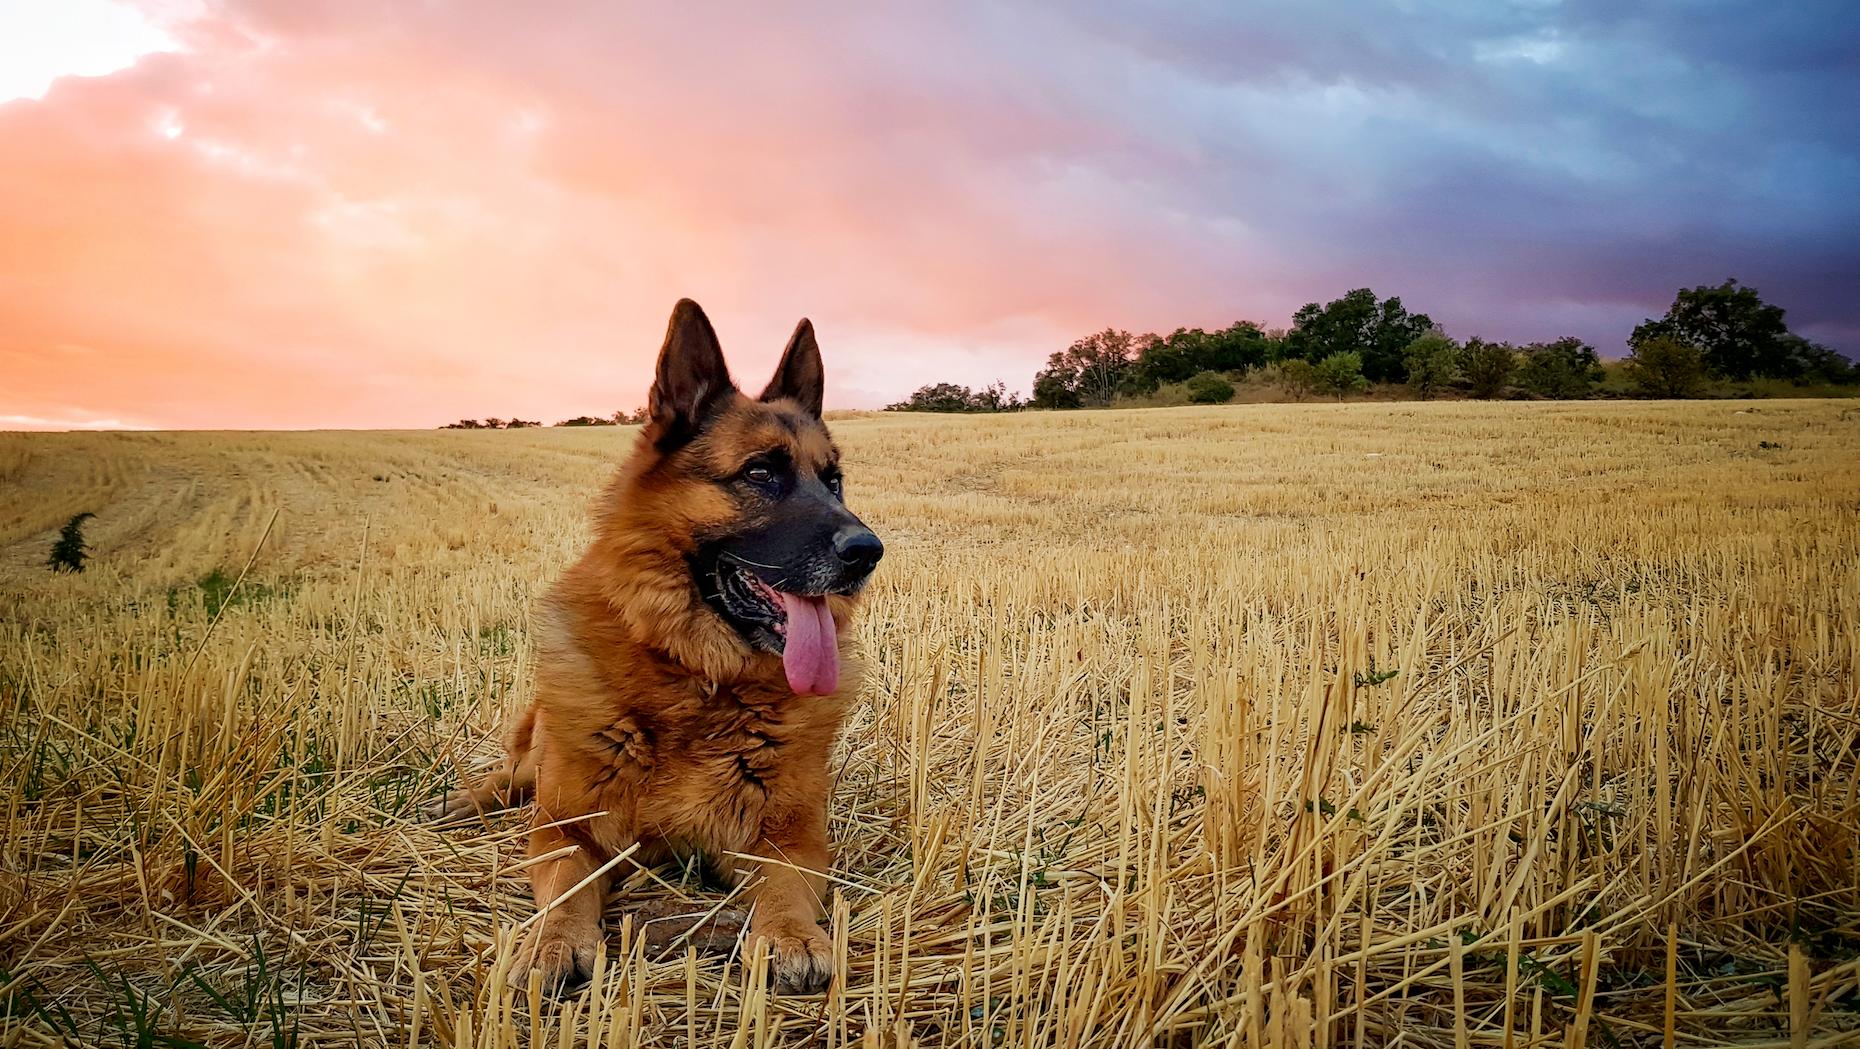 german shepherd dog in field with sunset